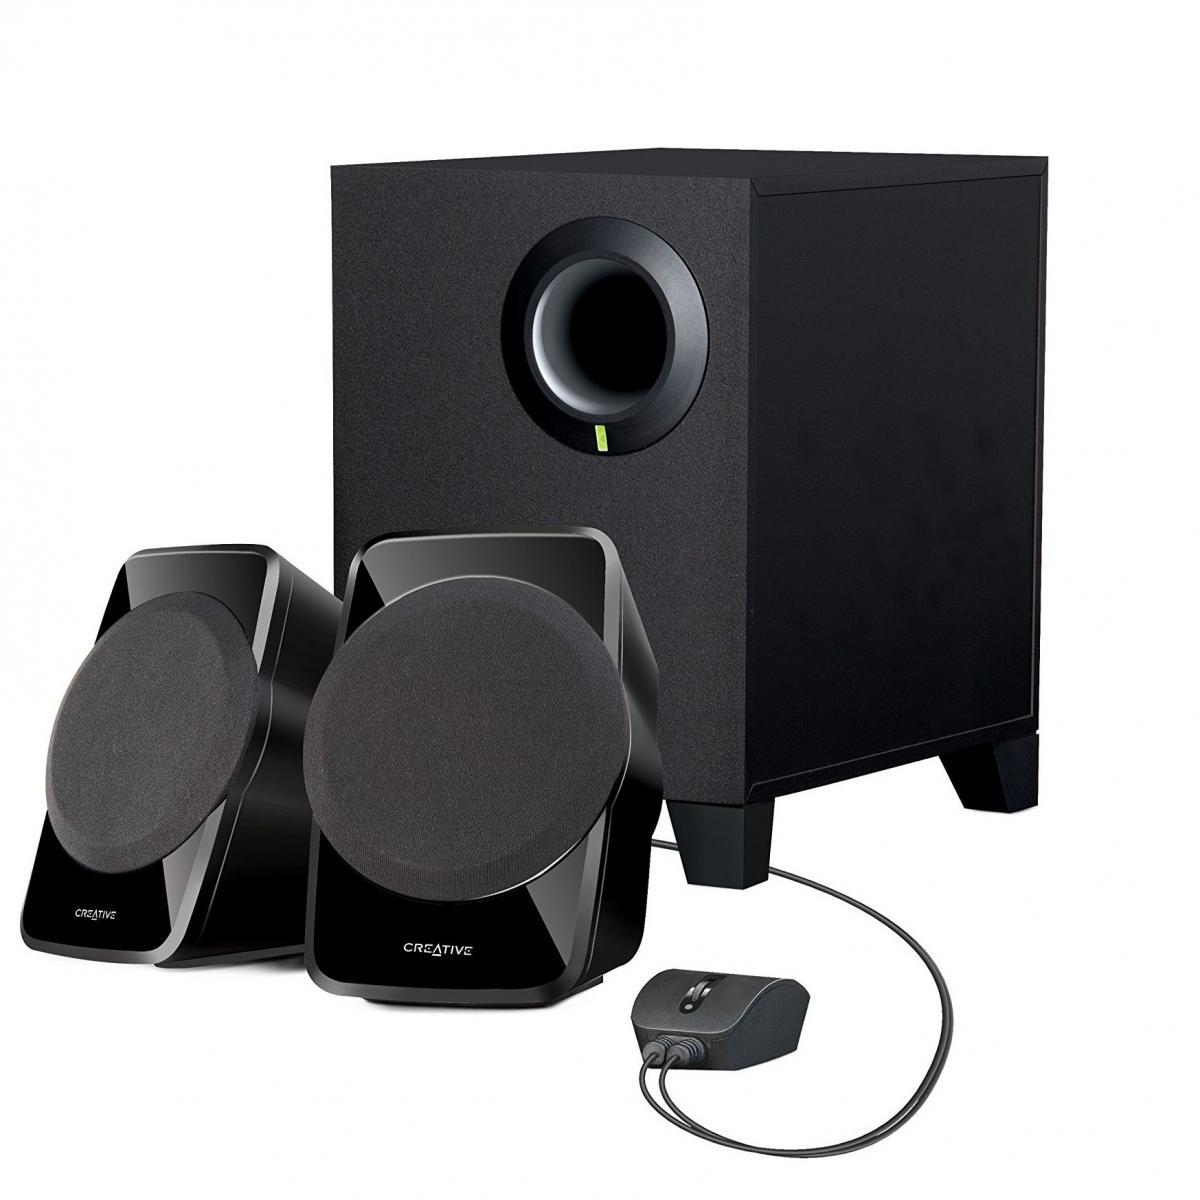 Creative Sbs A120 Multimedia Speakers Sbs A120 Smart